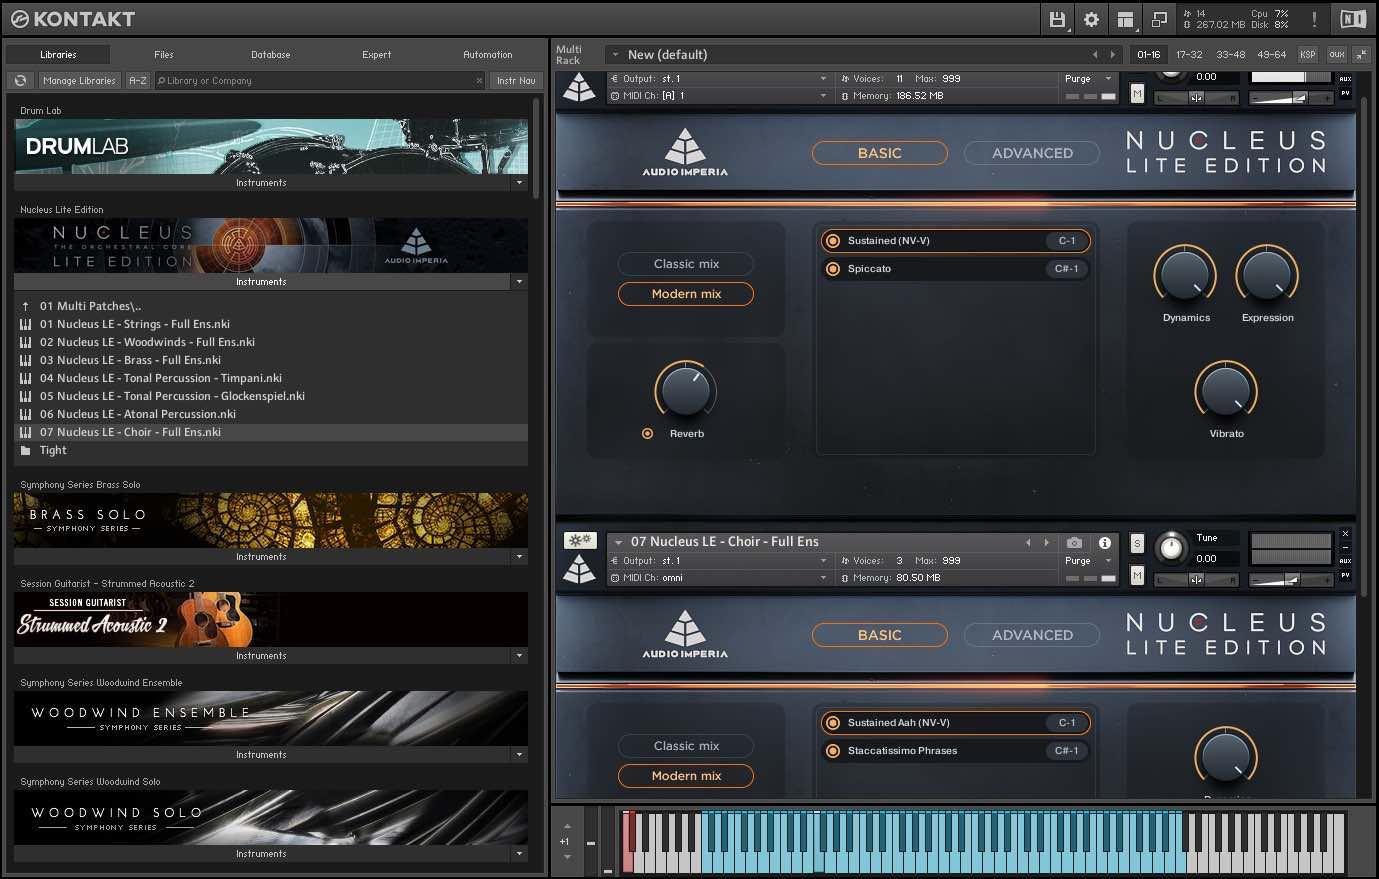 Audio Imperia Nucleus Lite libreria virtual instrument orchestra score audiofader test kontakt native instruments prezzo